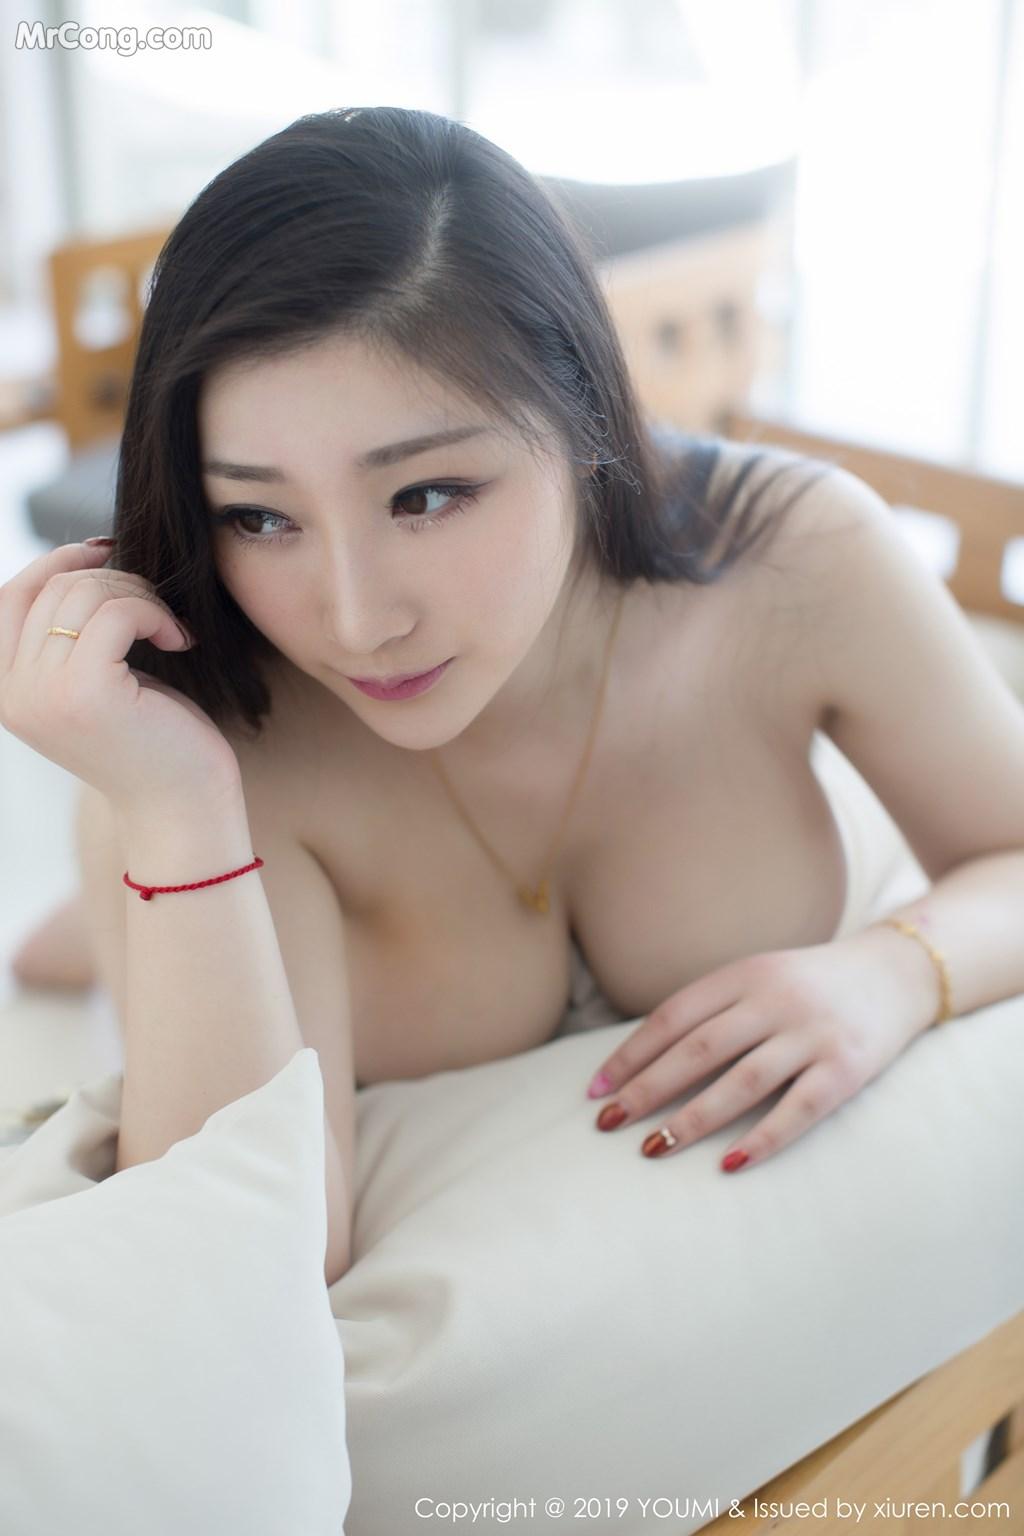 YouMi Vol.344: Daji_Toxic (妲己_Toxic) (48P)